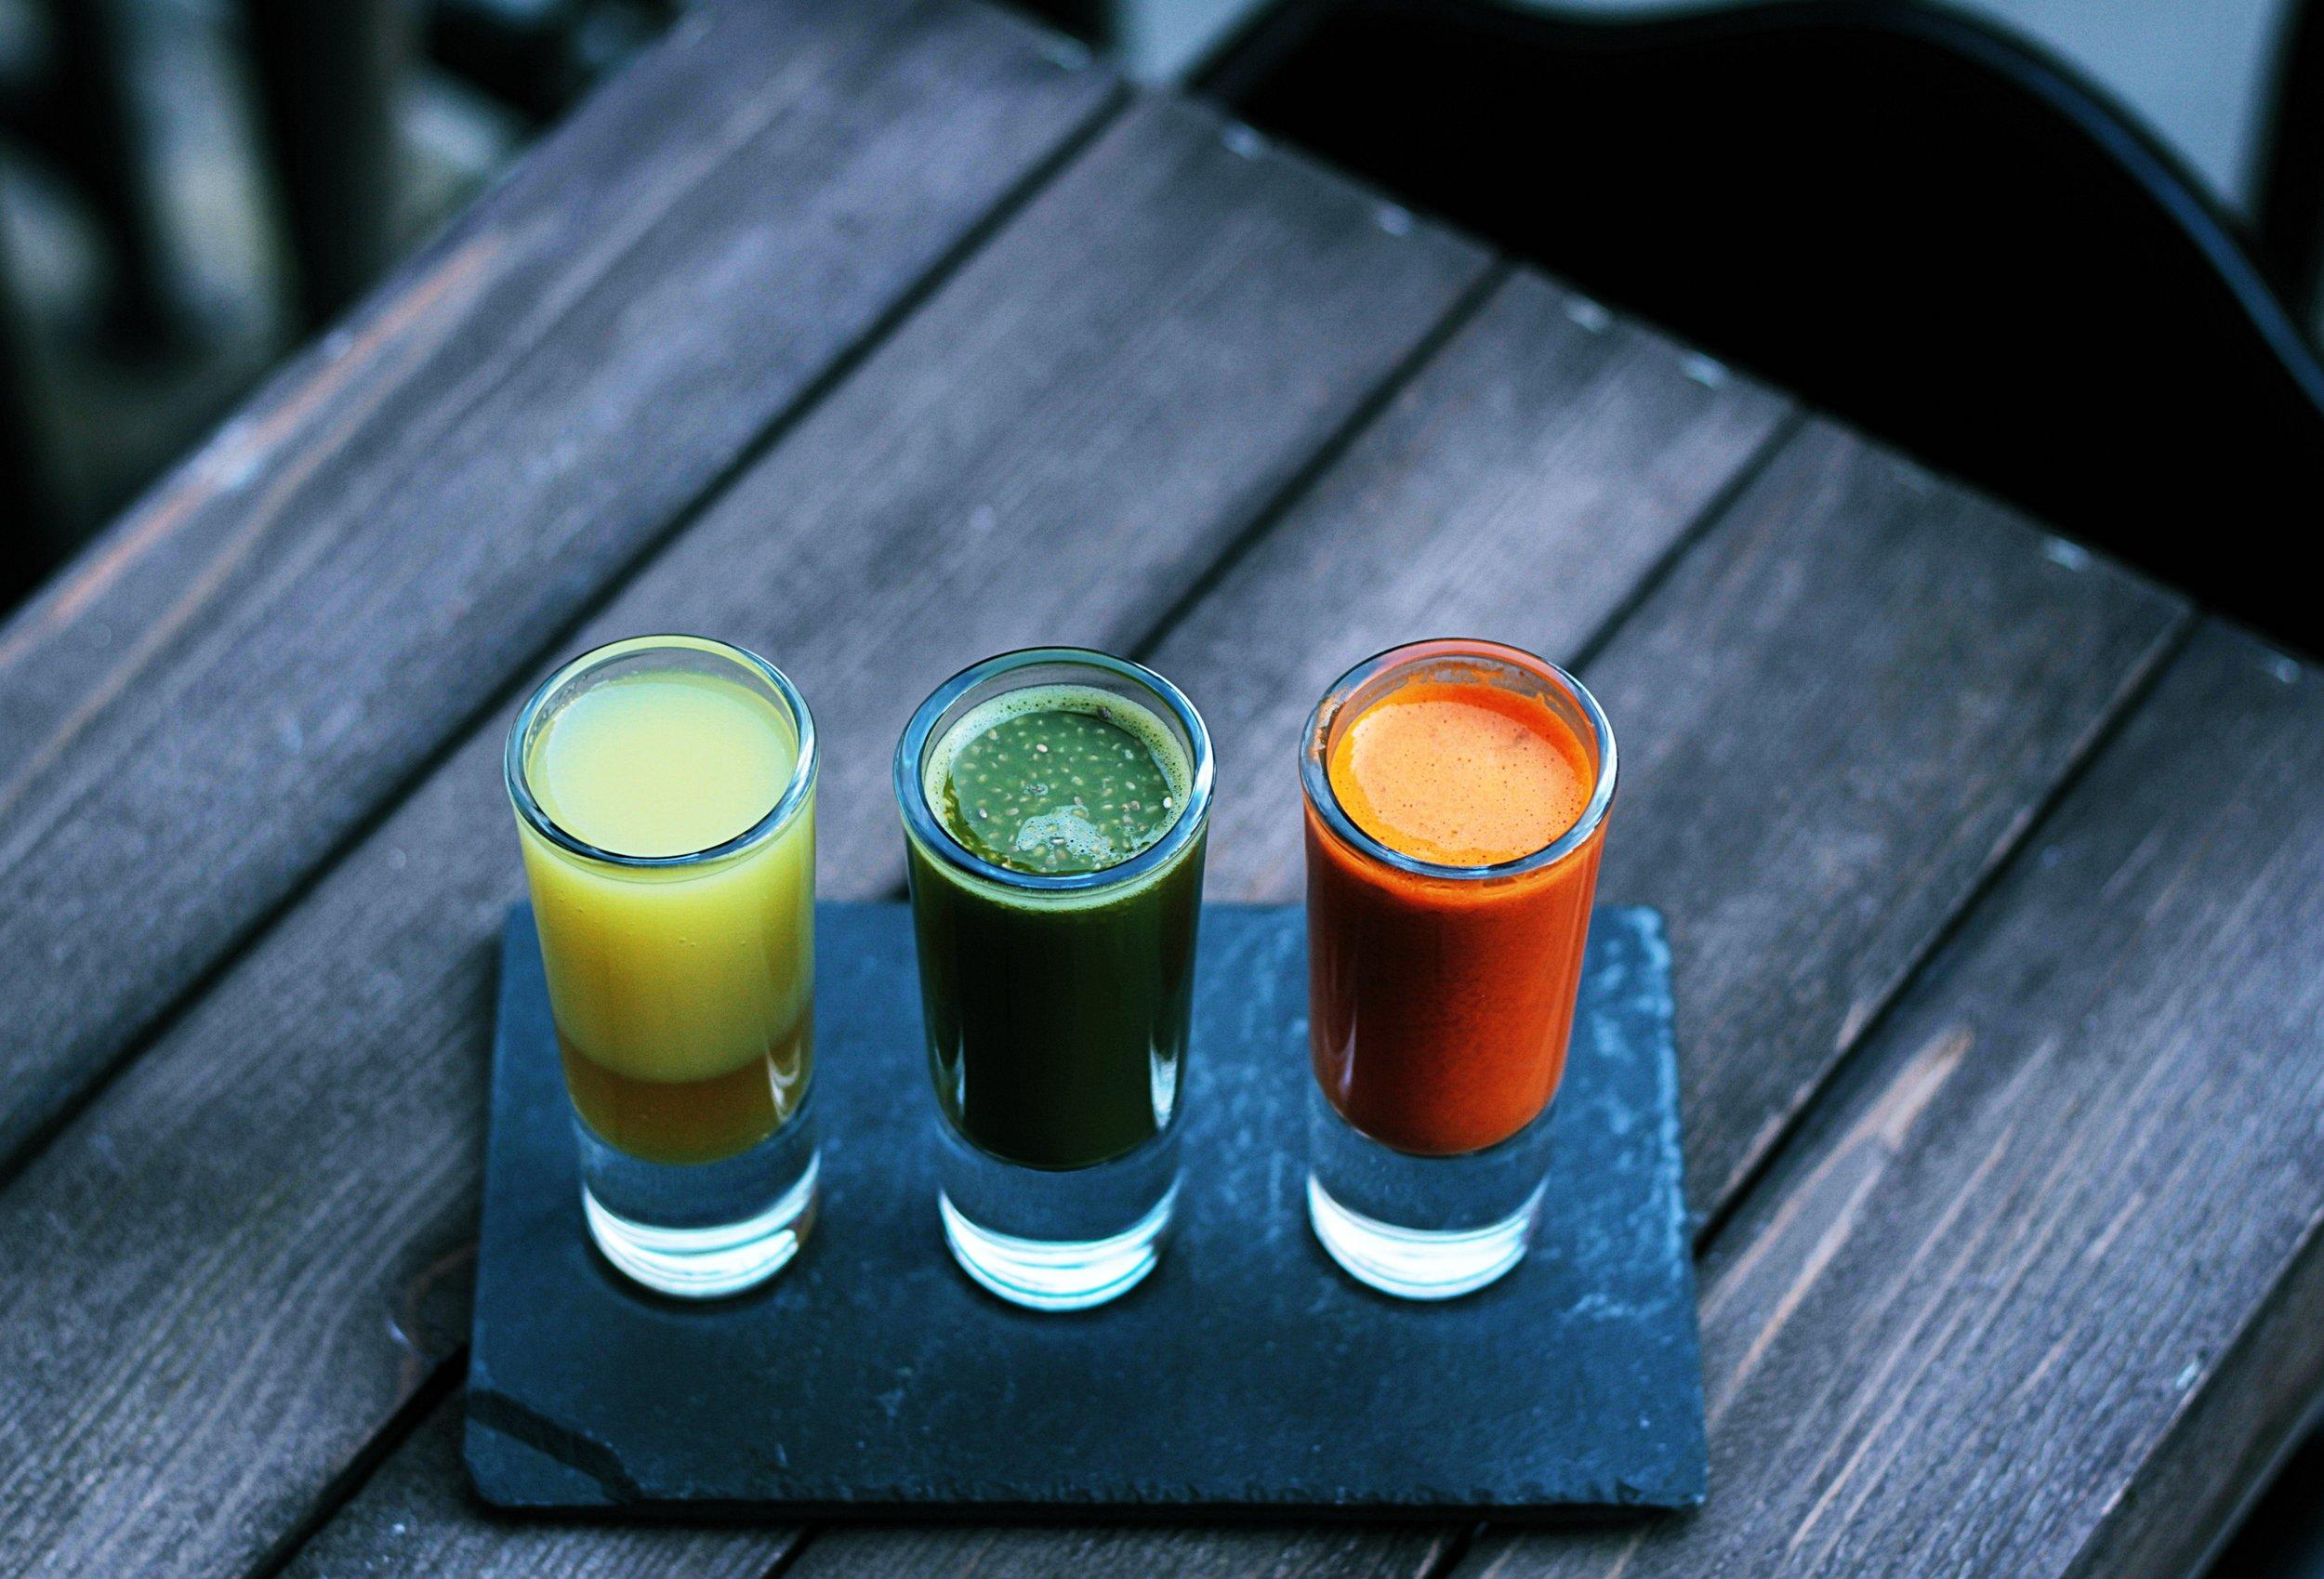 Why a Juice Cleanse? By Skondasana Yoga Wellness Marketing